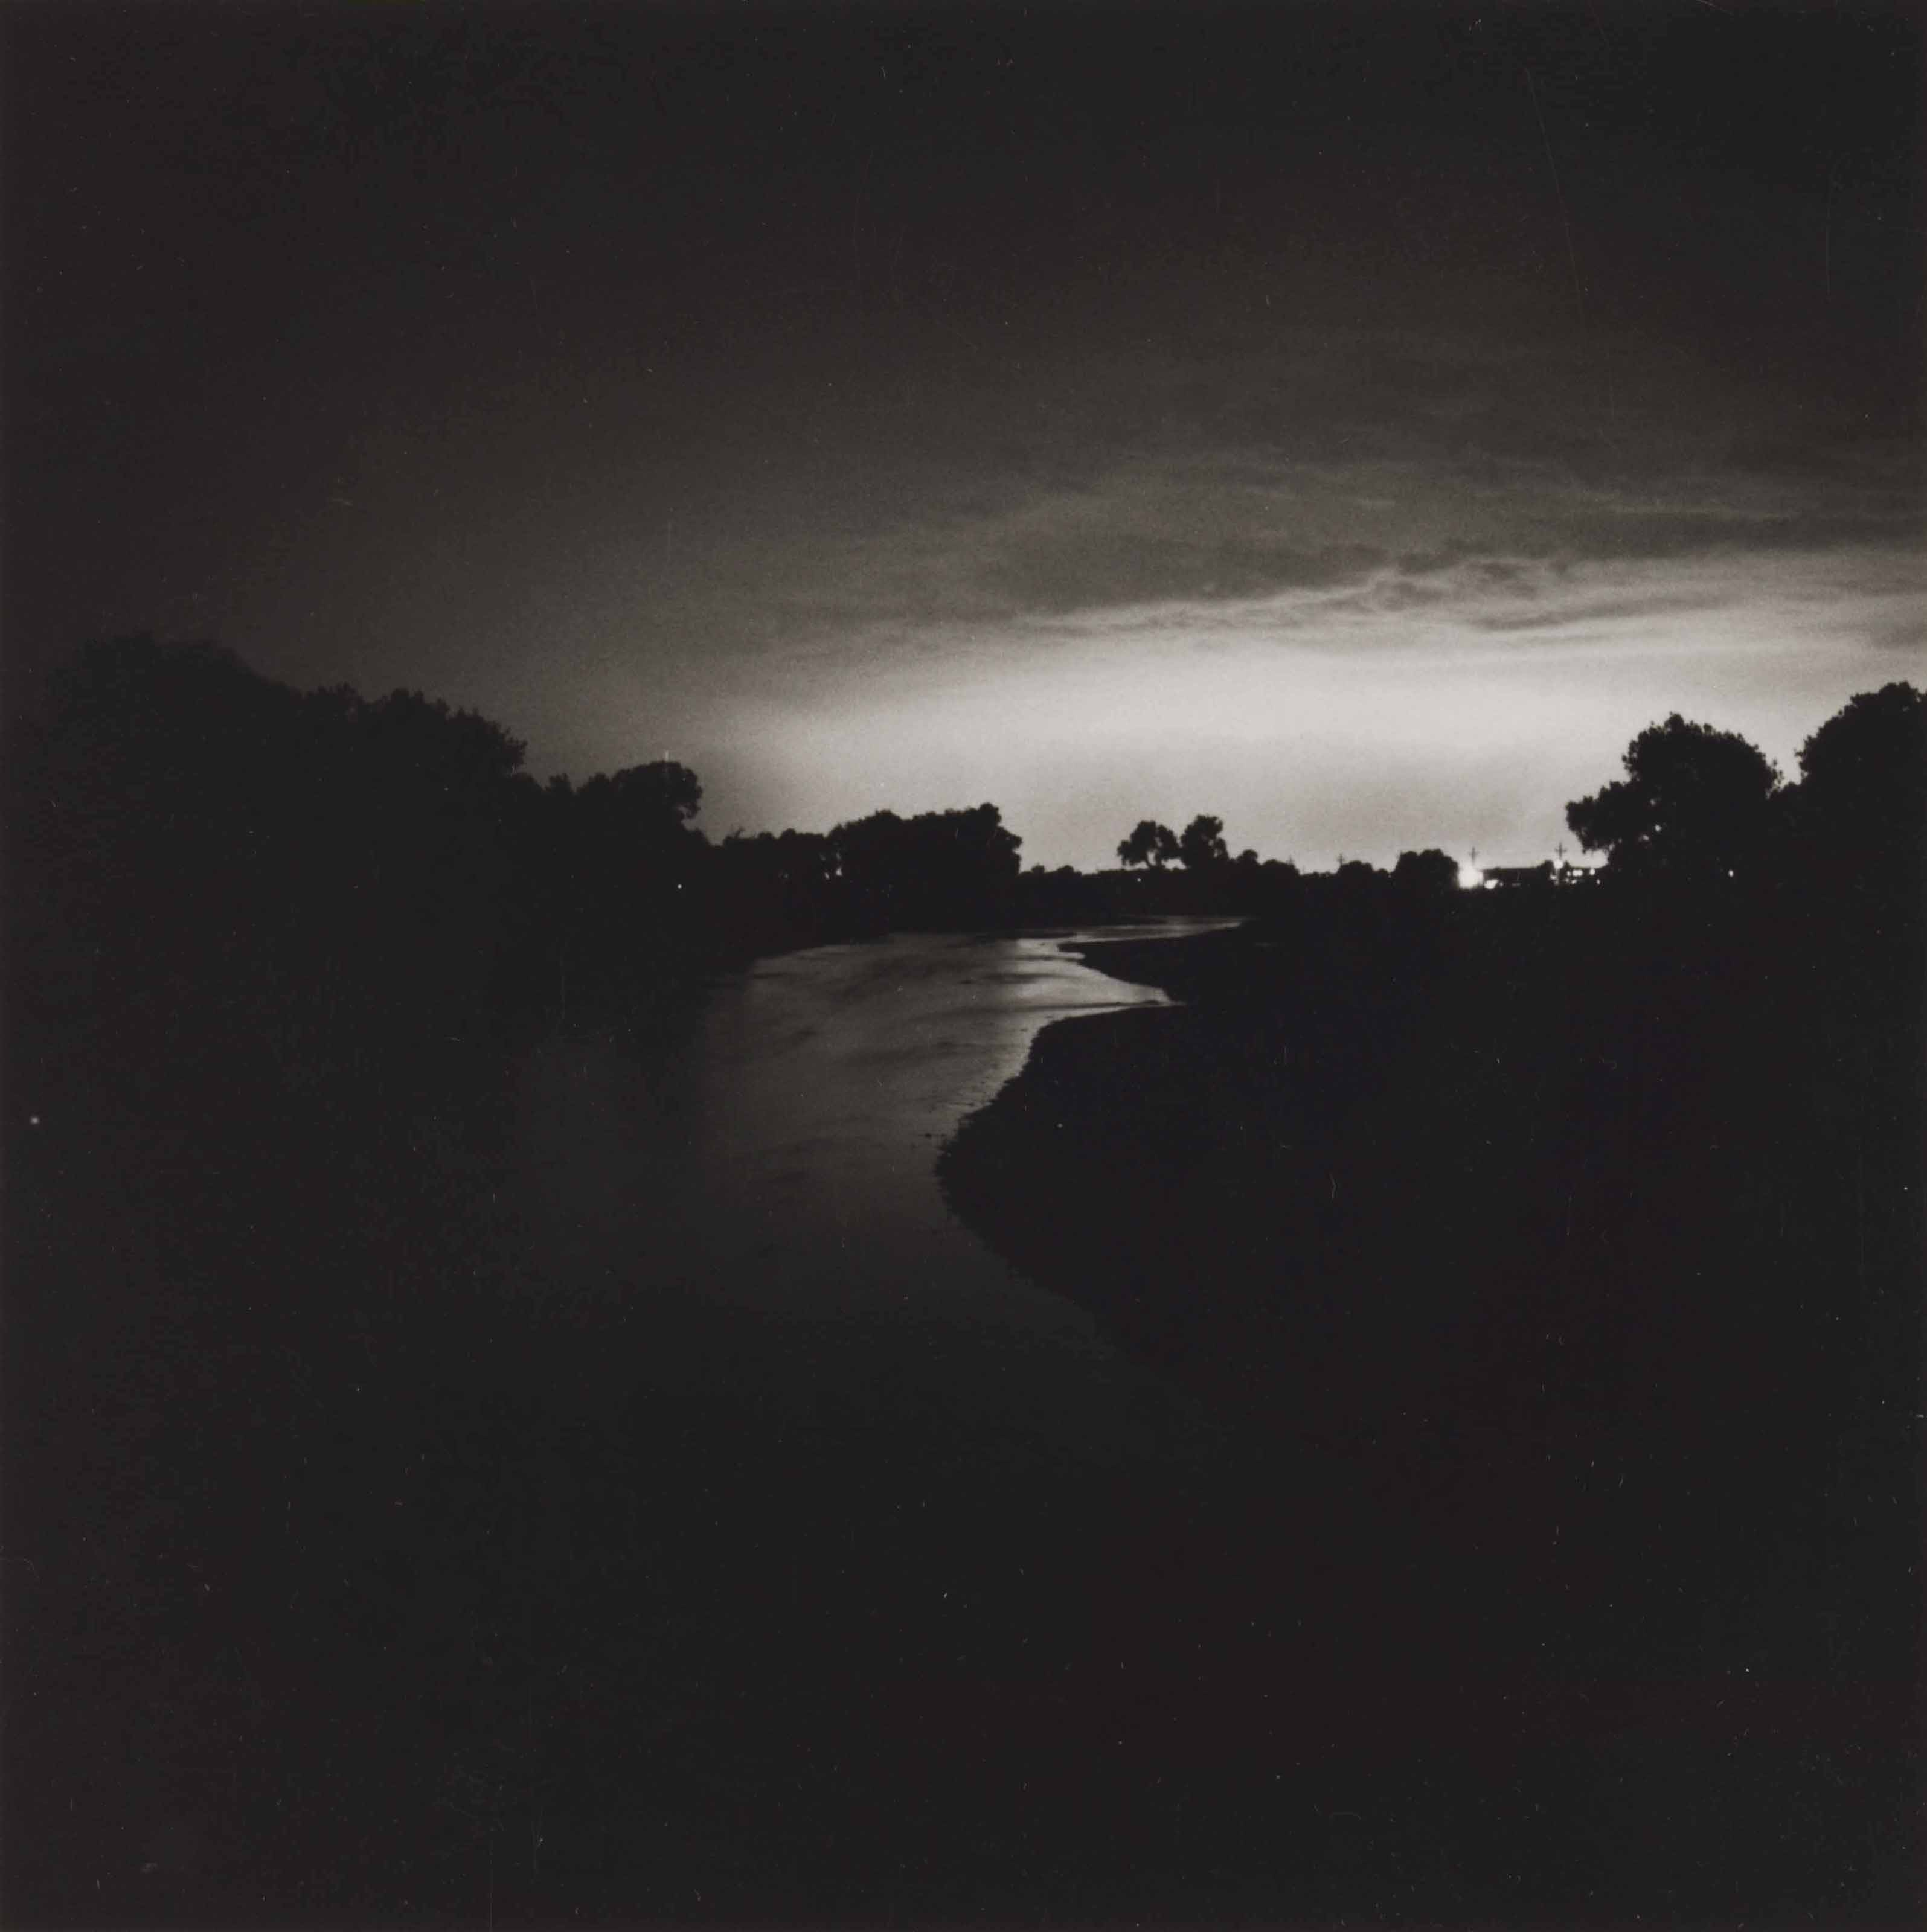 The South Platte River, Looking toward Denver, Colorado, twenty-five miles distant, 1979